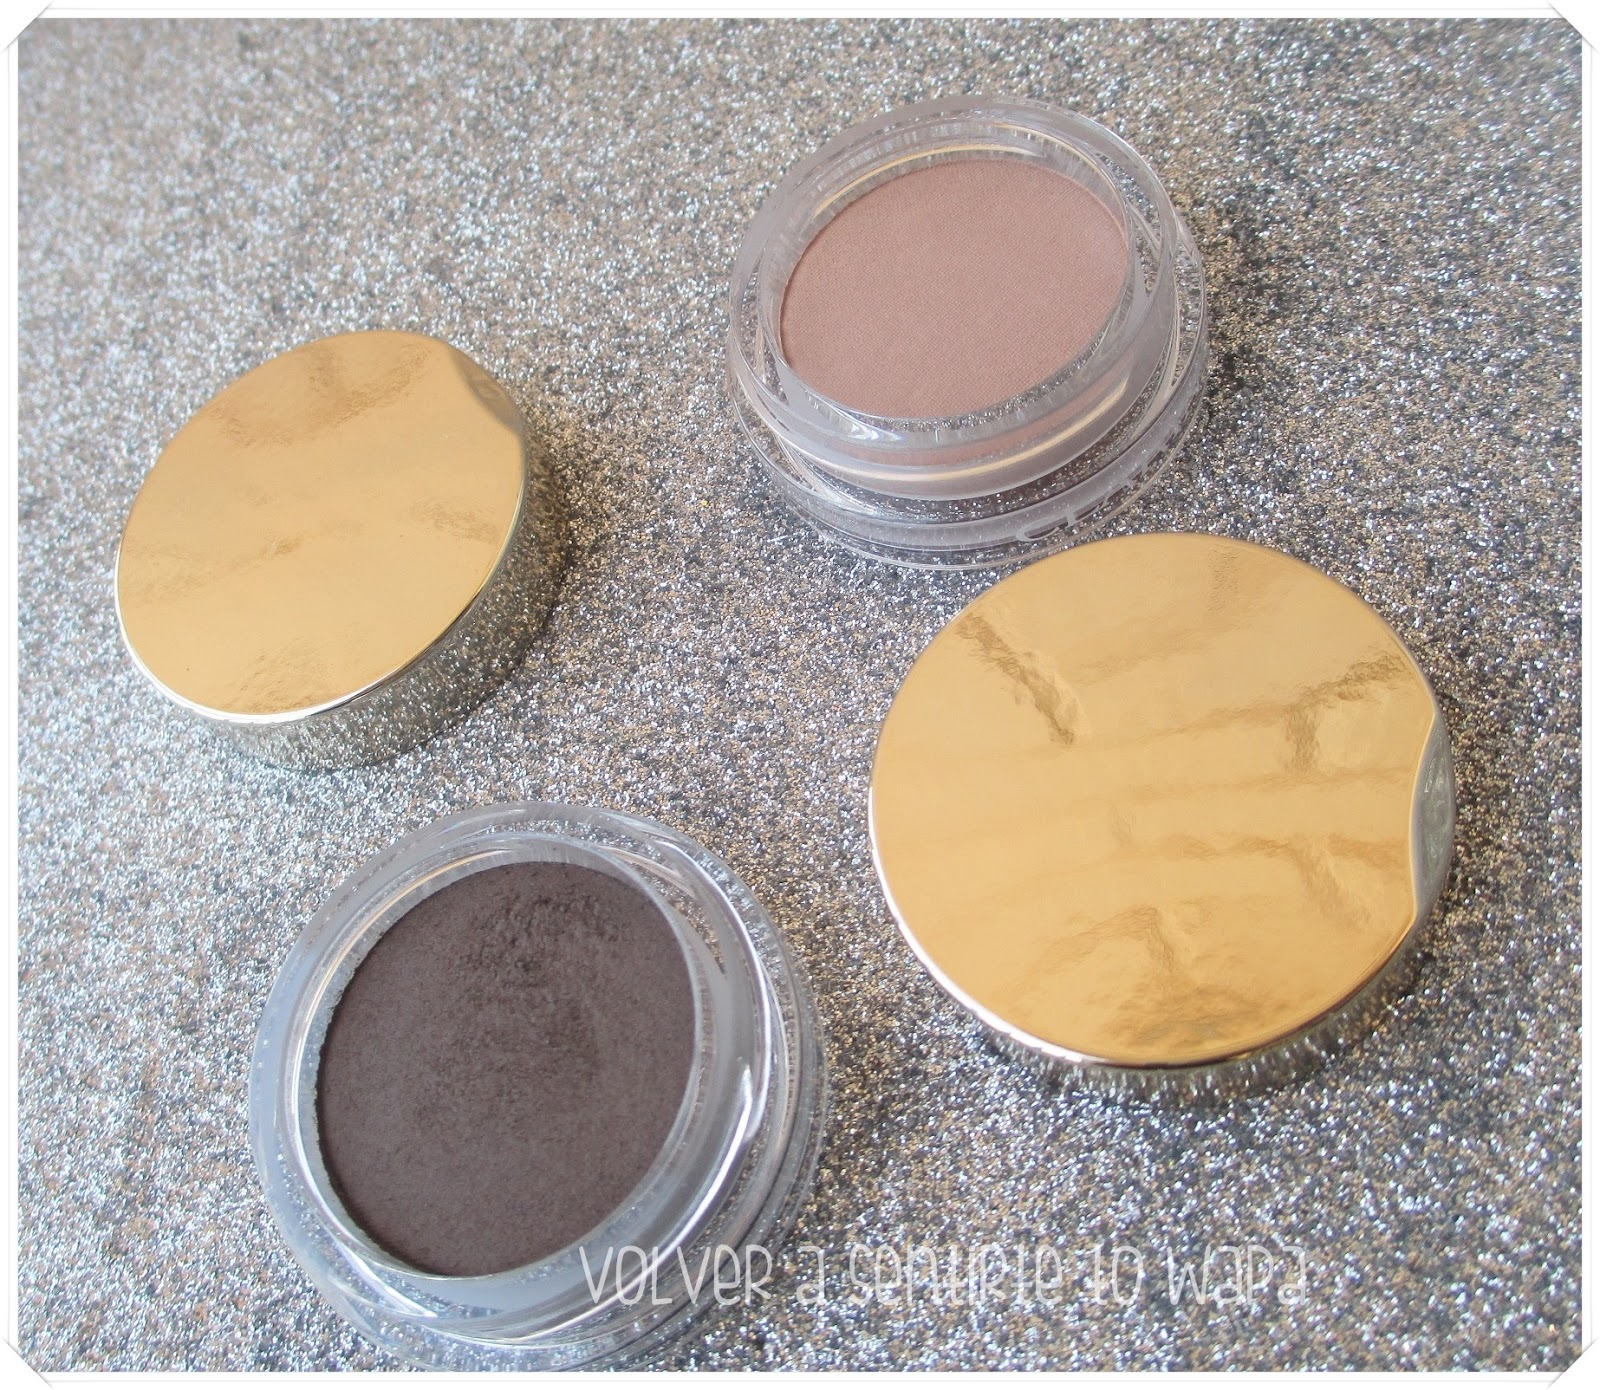 2 sombras en crema con textura polvo: Ombre Matte de Clarins